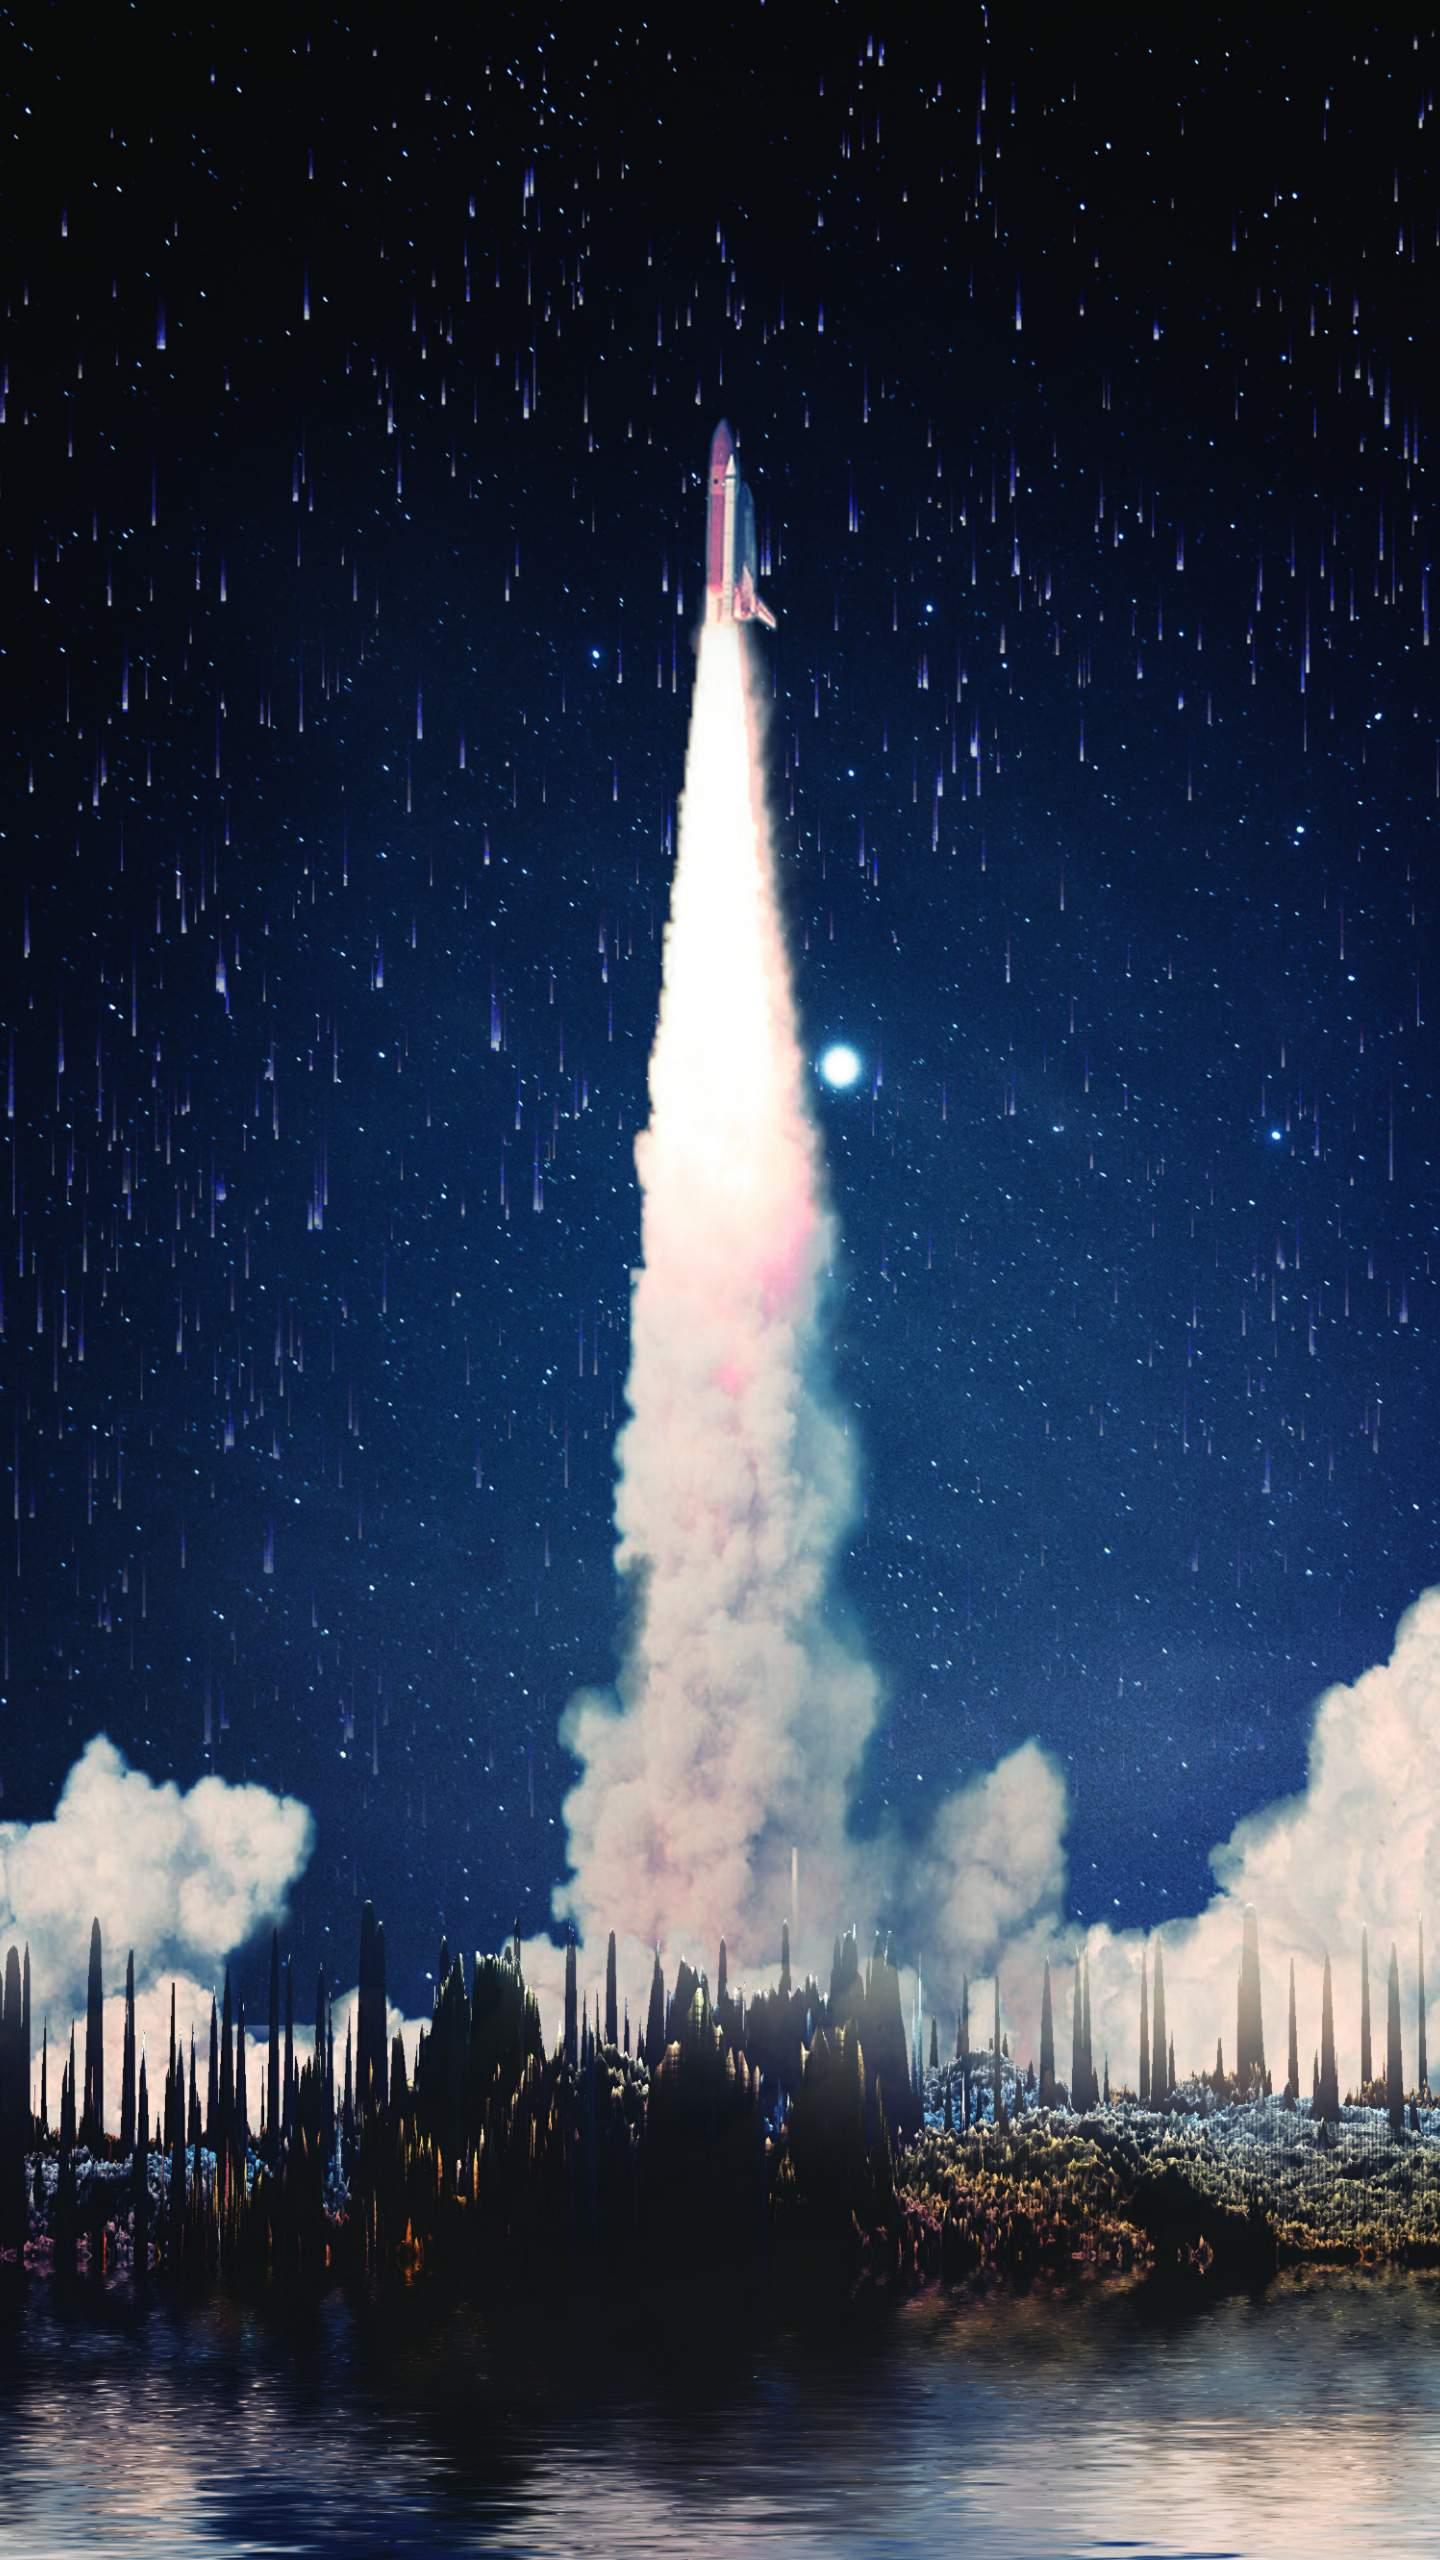 The Rocket Launch iPhone Wallpaper